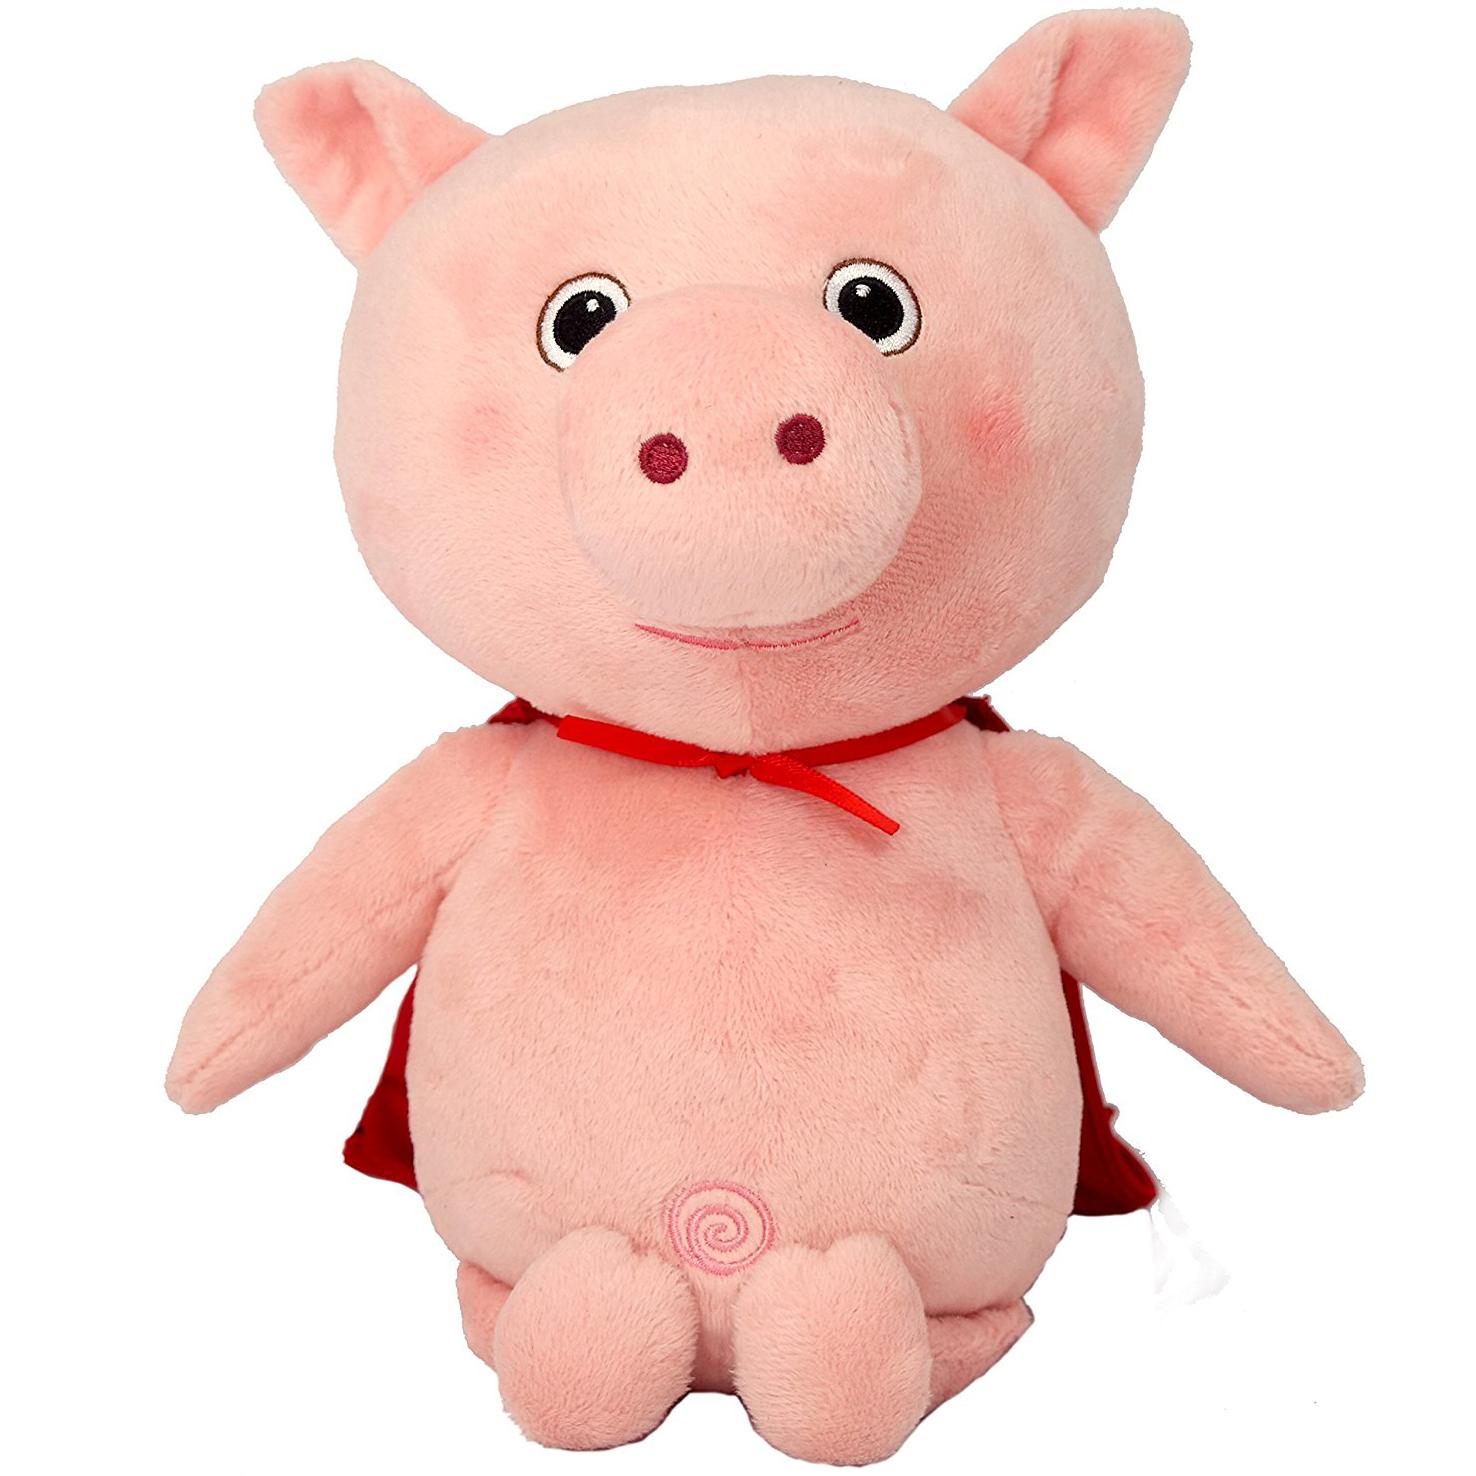 Little Baby Bum Musical Pig Singing Γουρουνάκι, Μουσικό Λούτρινο Παιχνίδι με 4 Τραγουδάκια Εκμάθησης